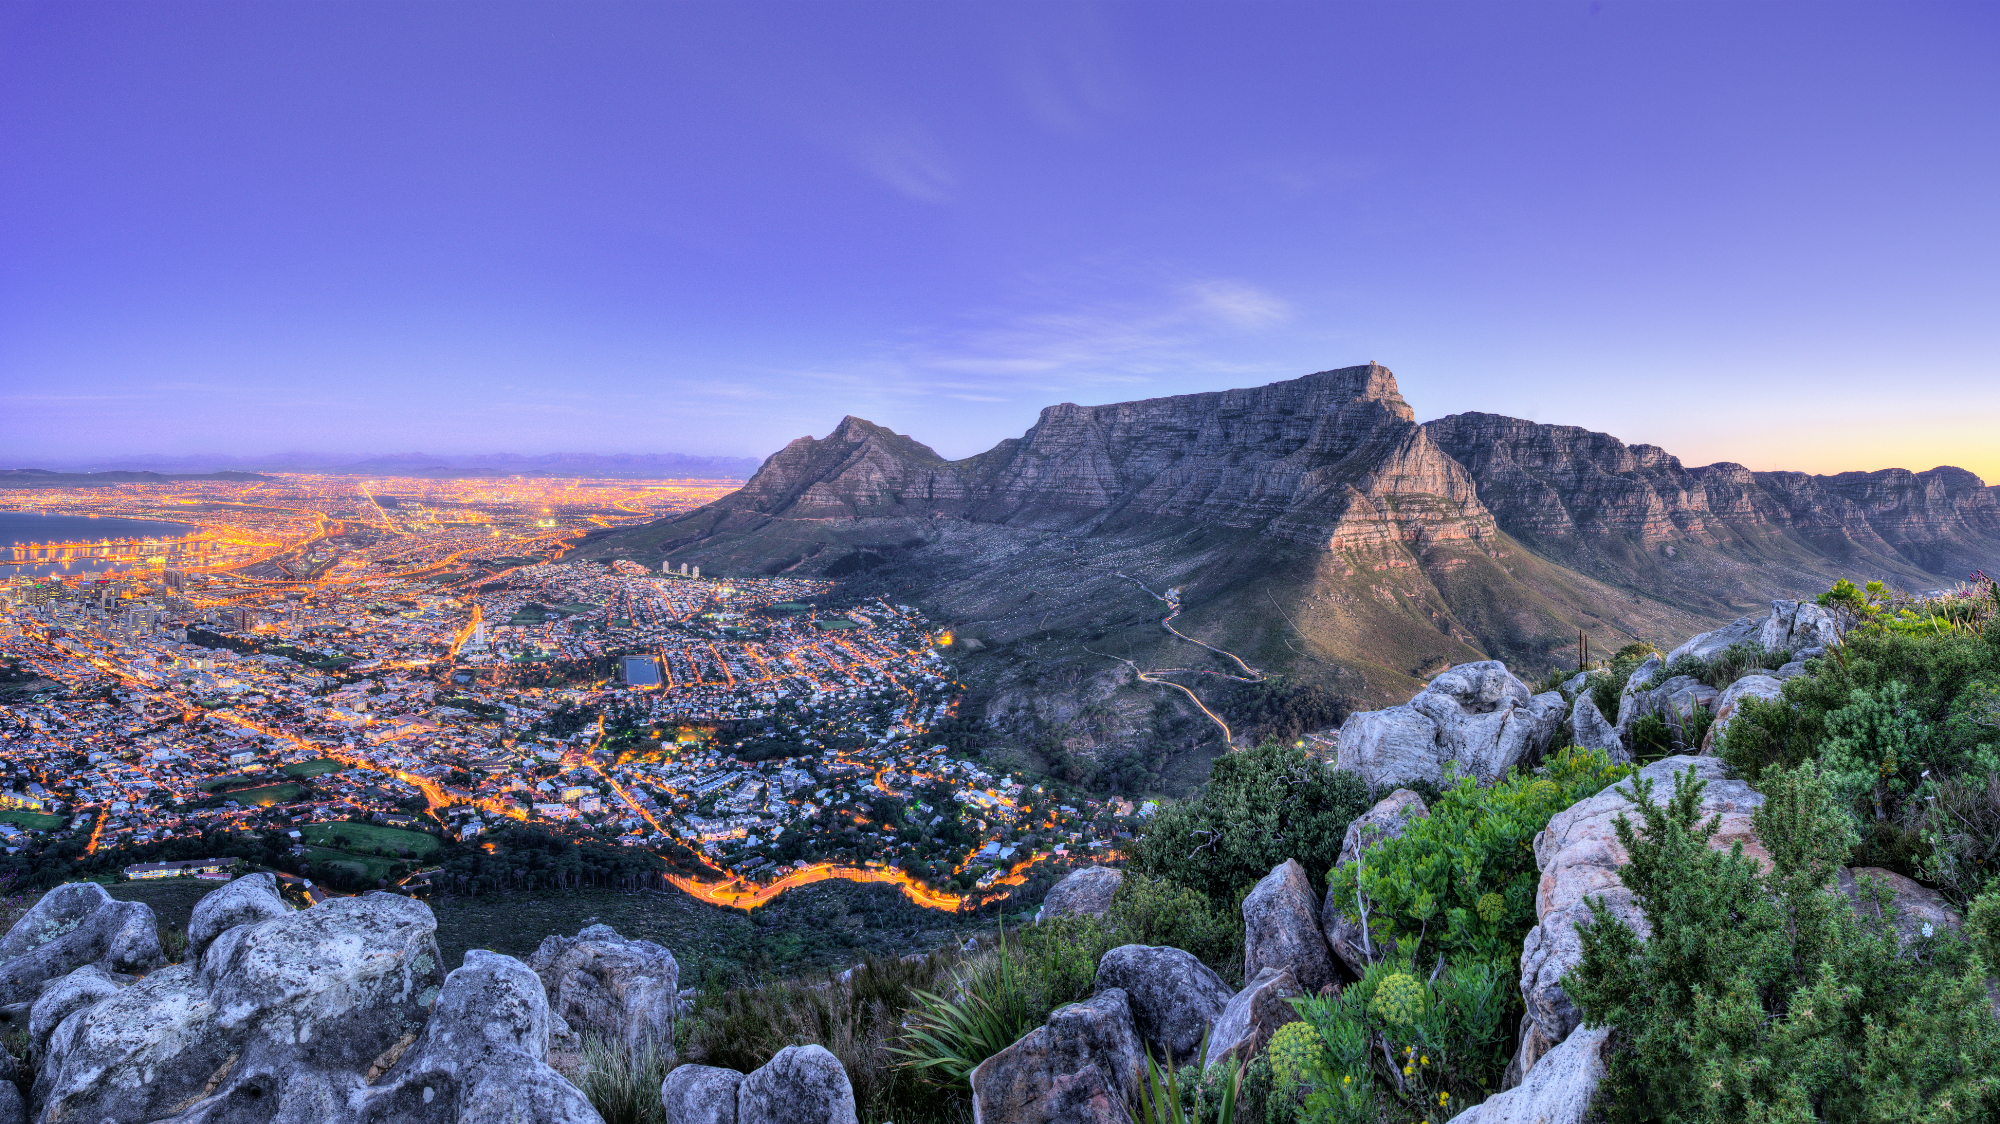 ITI Congress South Africa 2019